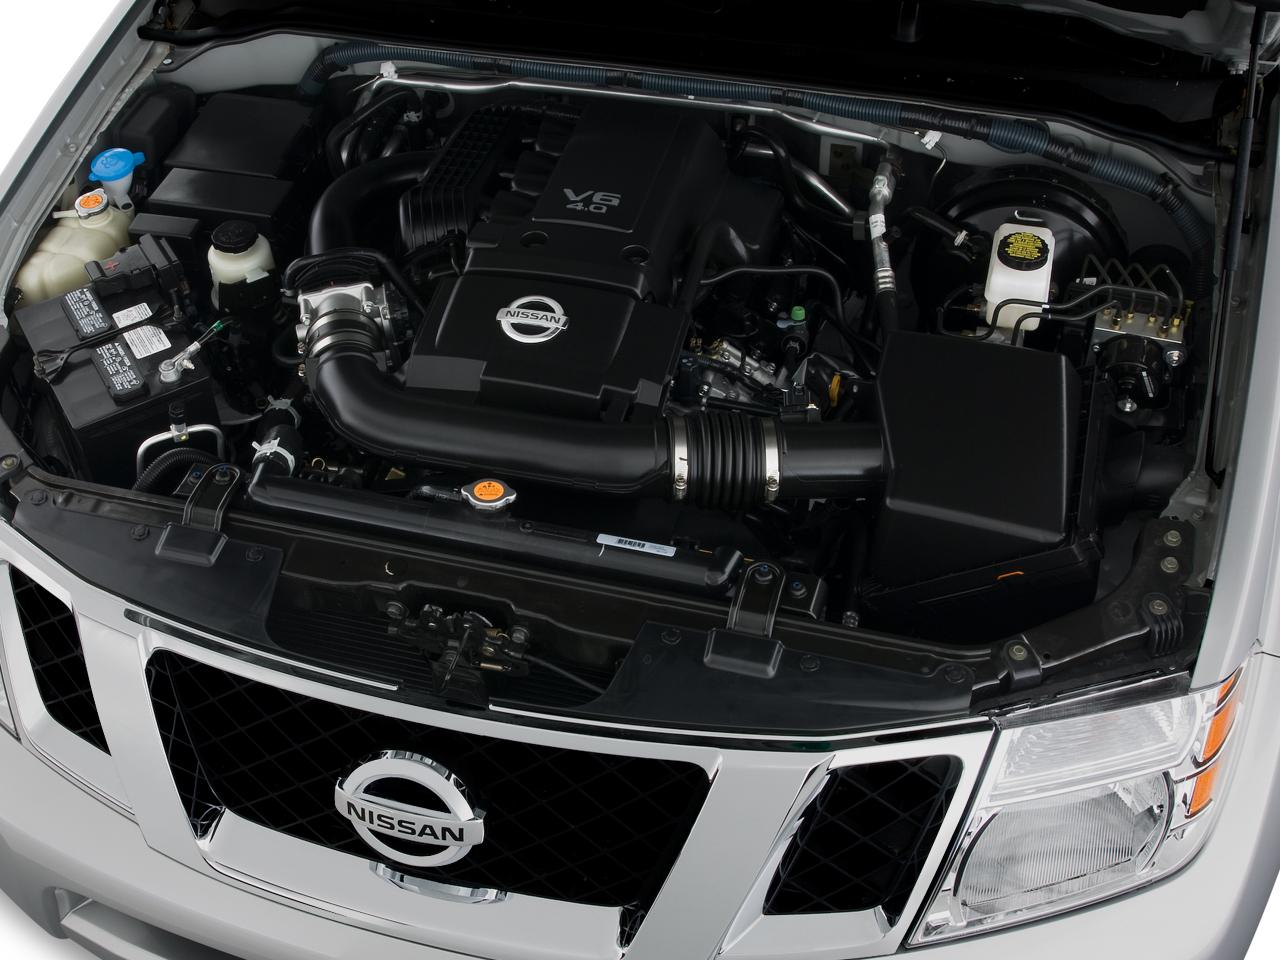 2008 Nissan Pathfinder Se Nissan Midsize Suv Review